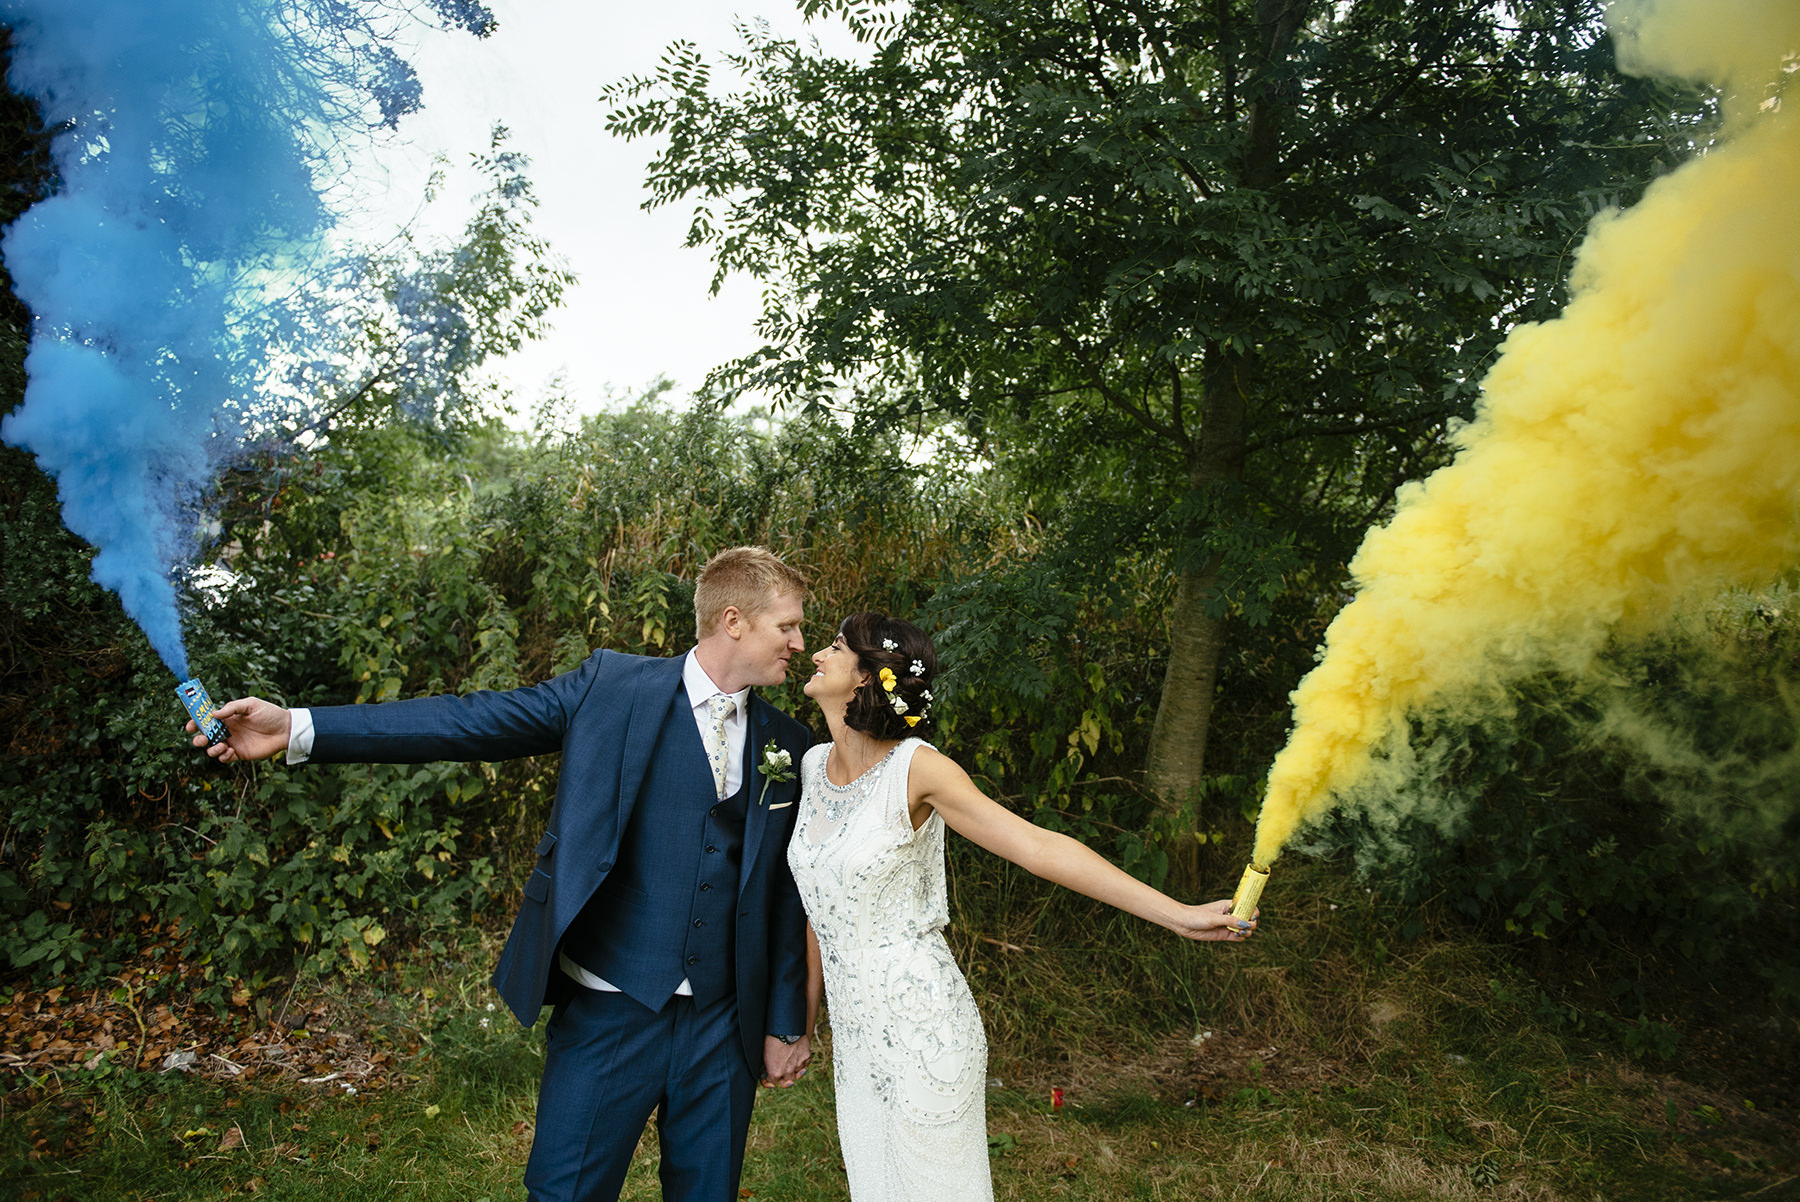 the-millhouse-slane-outdoor-wedding-05